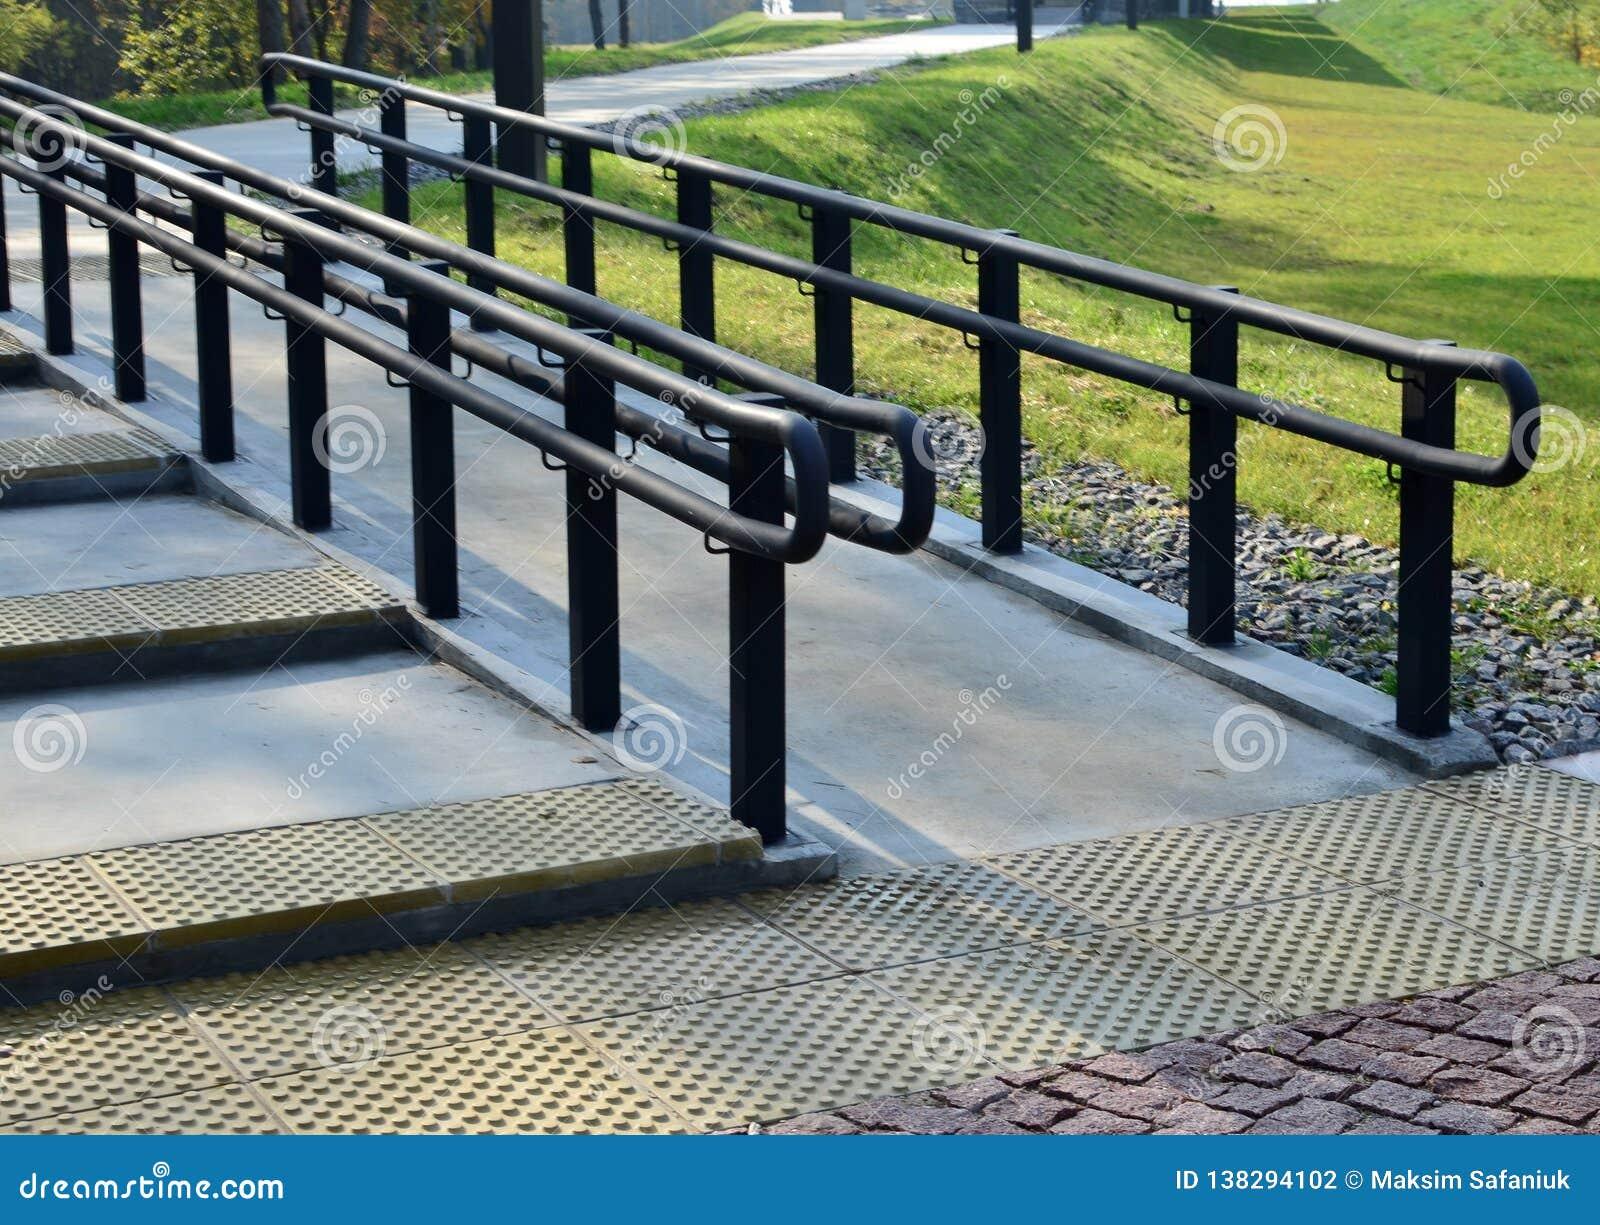 Urban railings, handrails for pedestrians